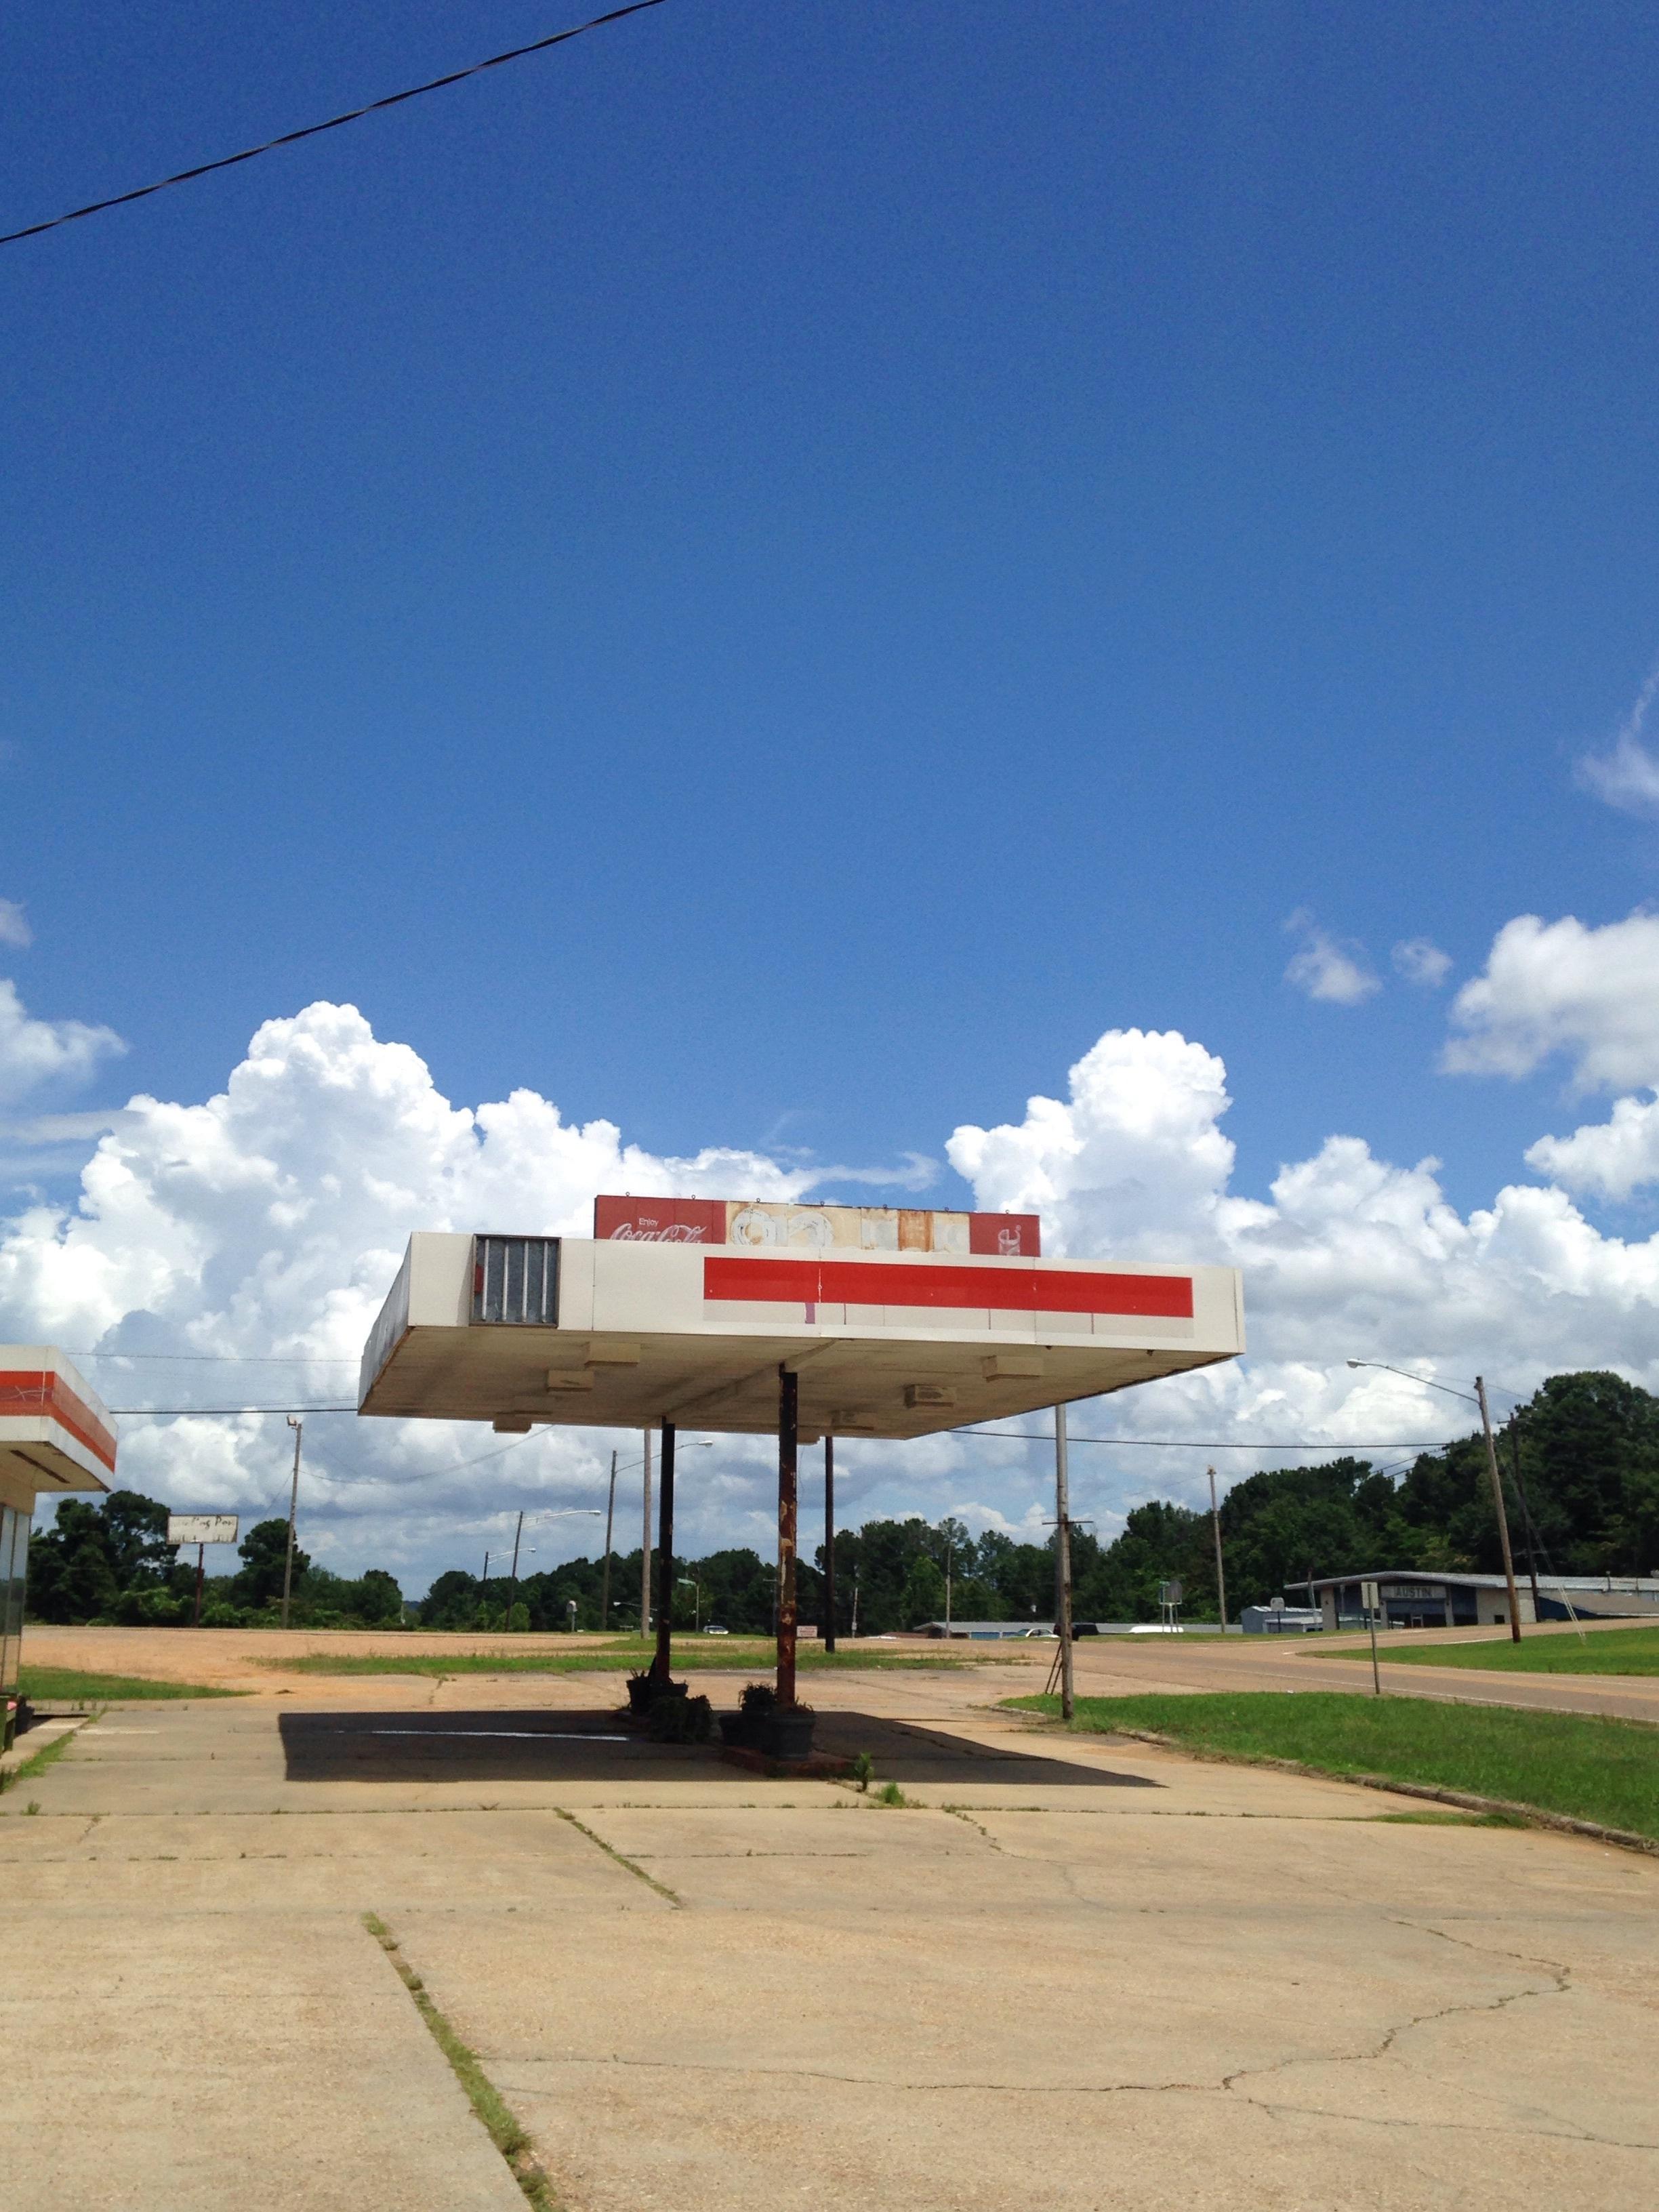 Abandoned drive-in hamburger stand, Winona, Mississippi, June 12, 2017.